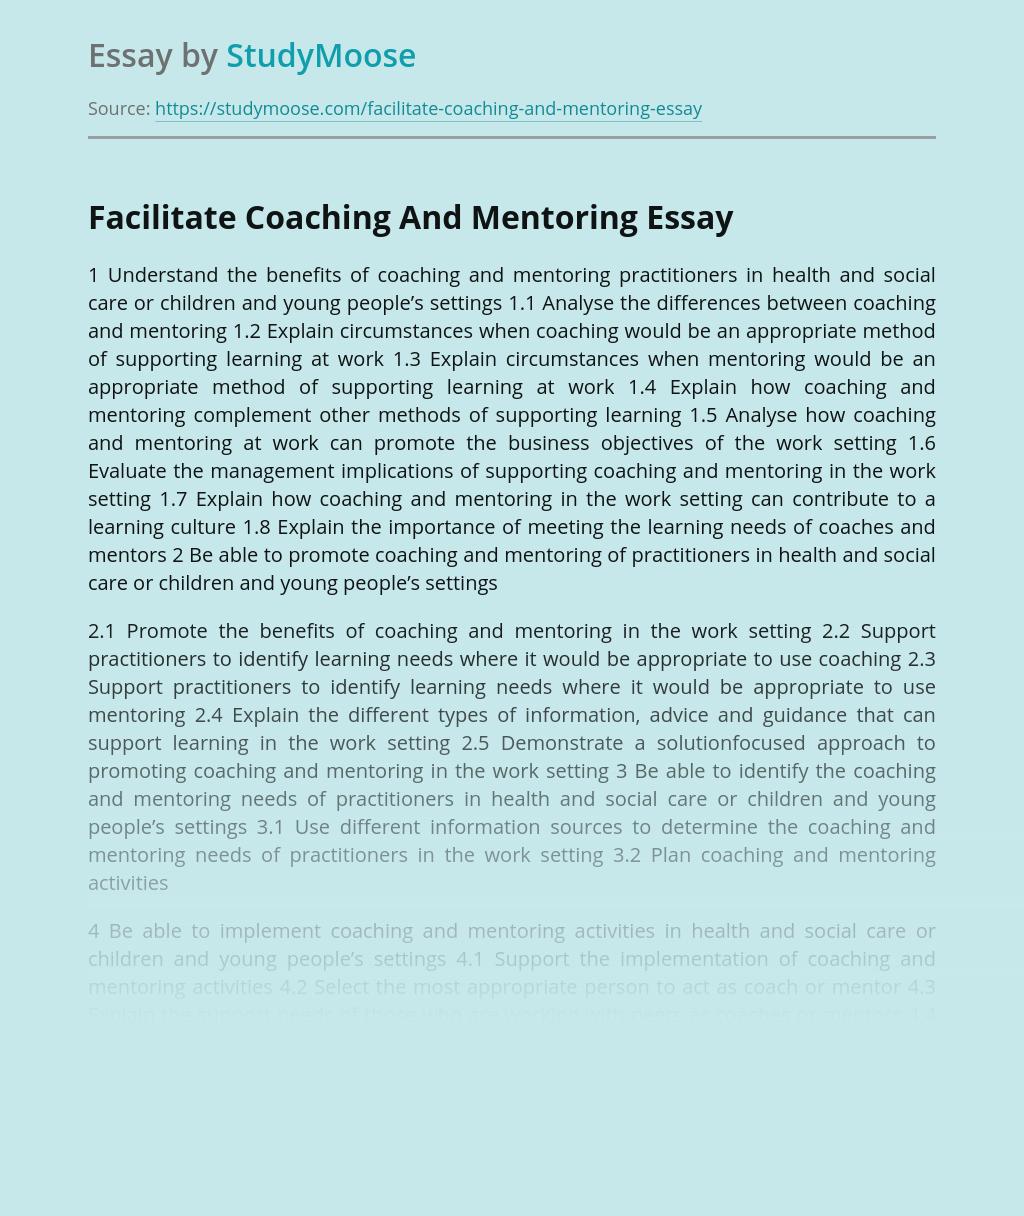 Facilitate Coaching And Mentoring